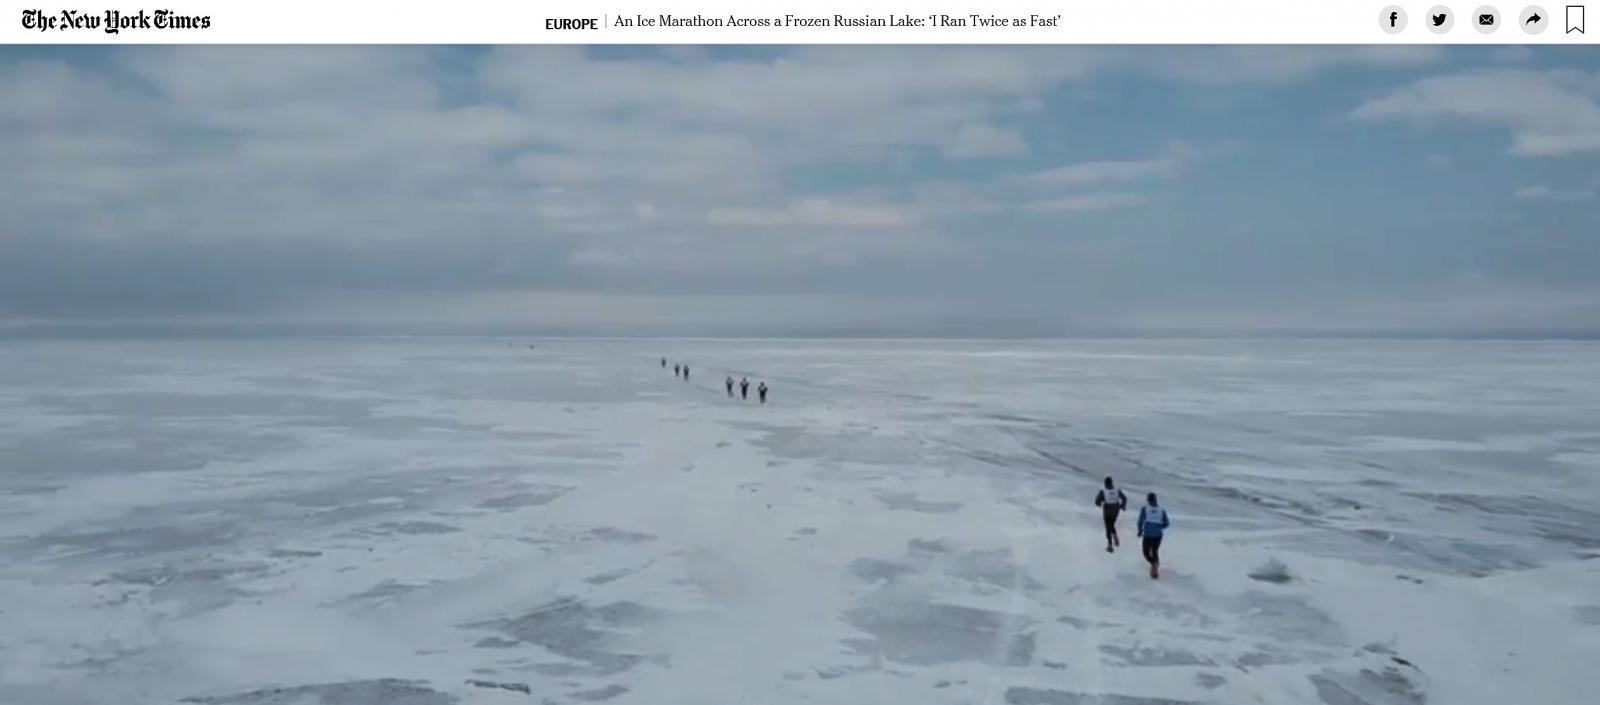 New York Times: An Ice Marathon Across a Frozen Russian Lake